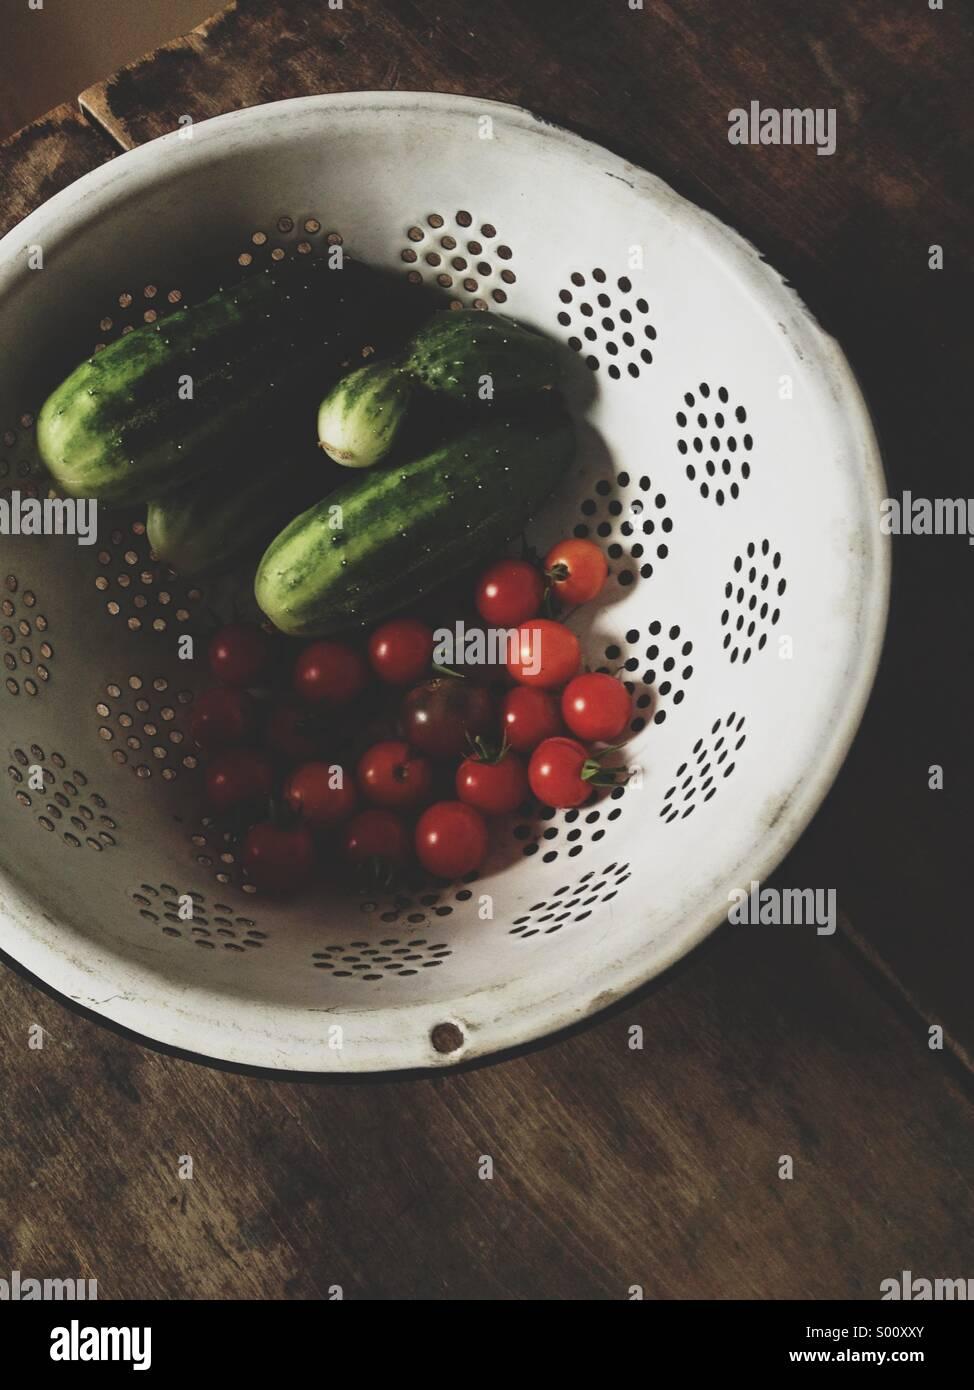 Vegetables harvested from garden. - Stock Image